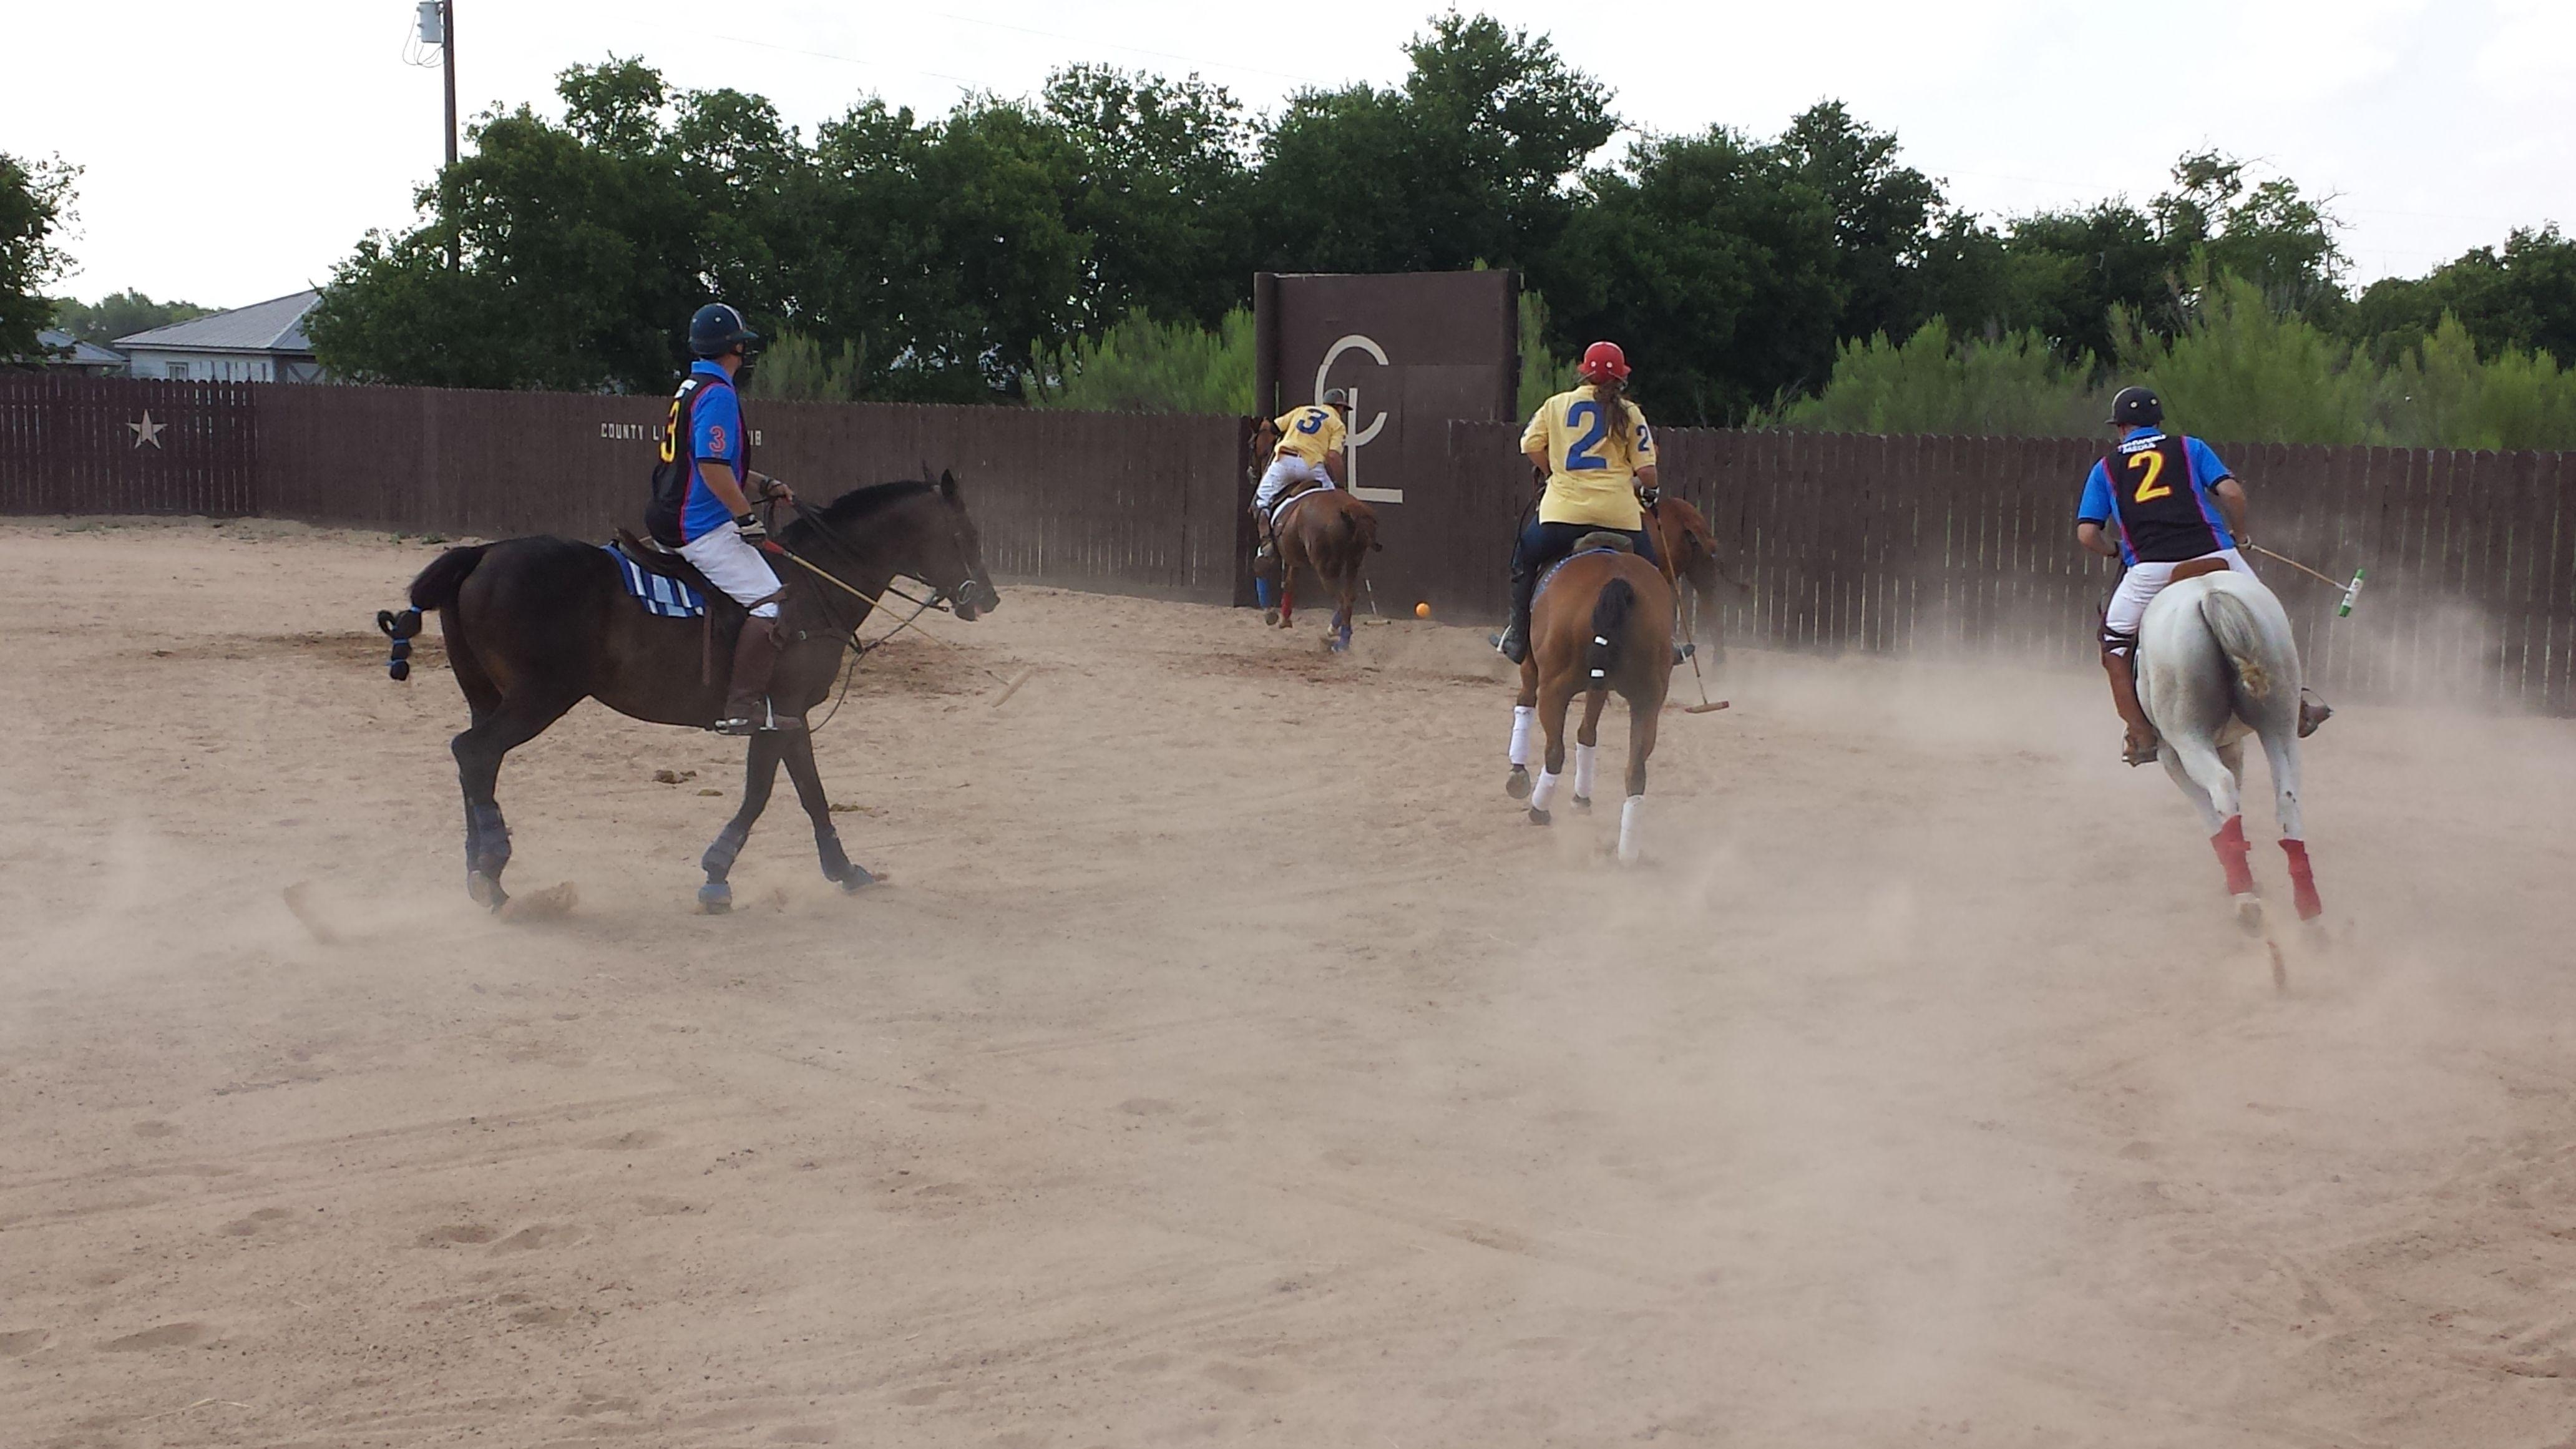 Arena polo in Texas. Photo by Diane Goforth Bray #polo #polohorses #countylinepolo #texas #poloplayers